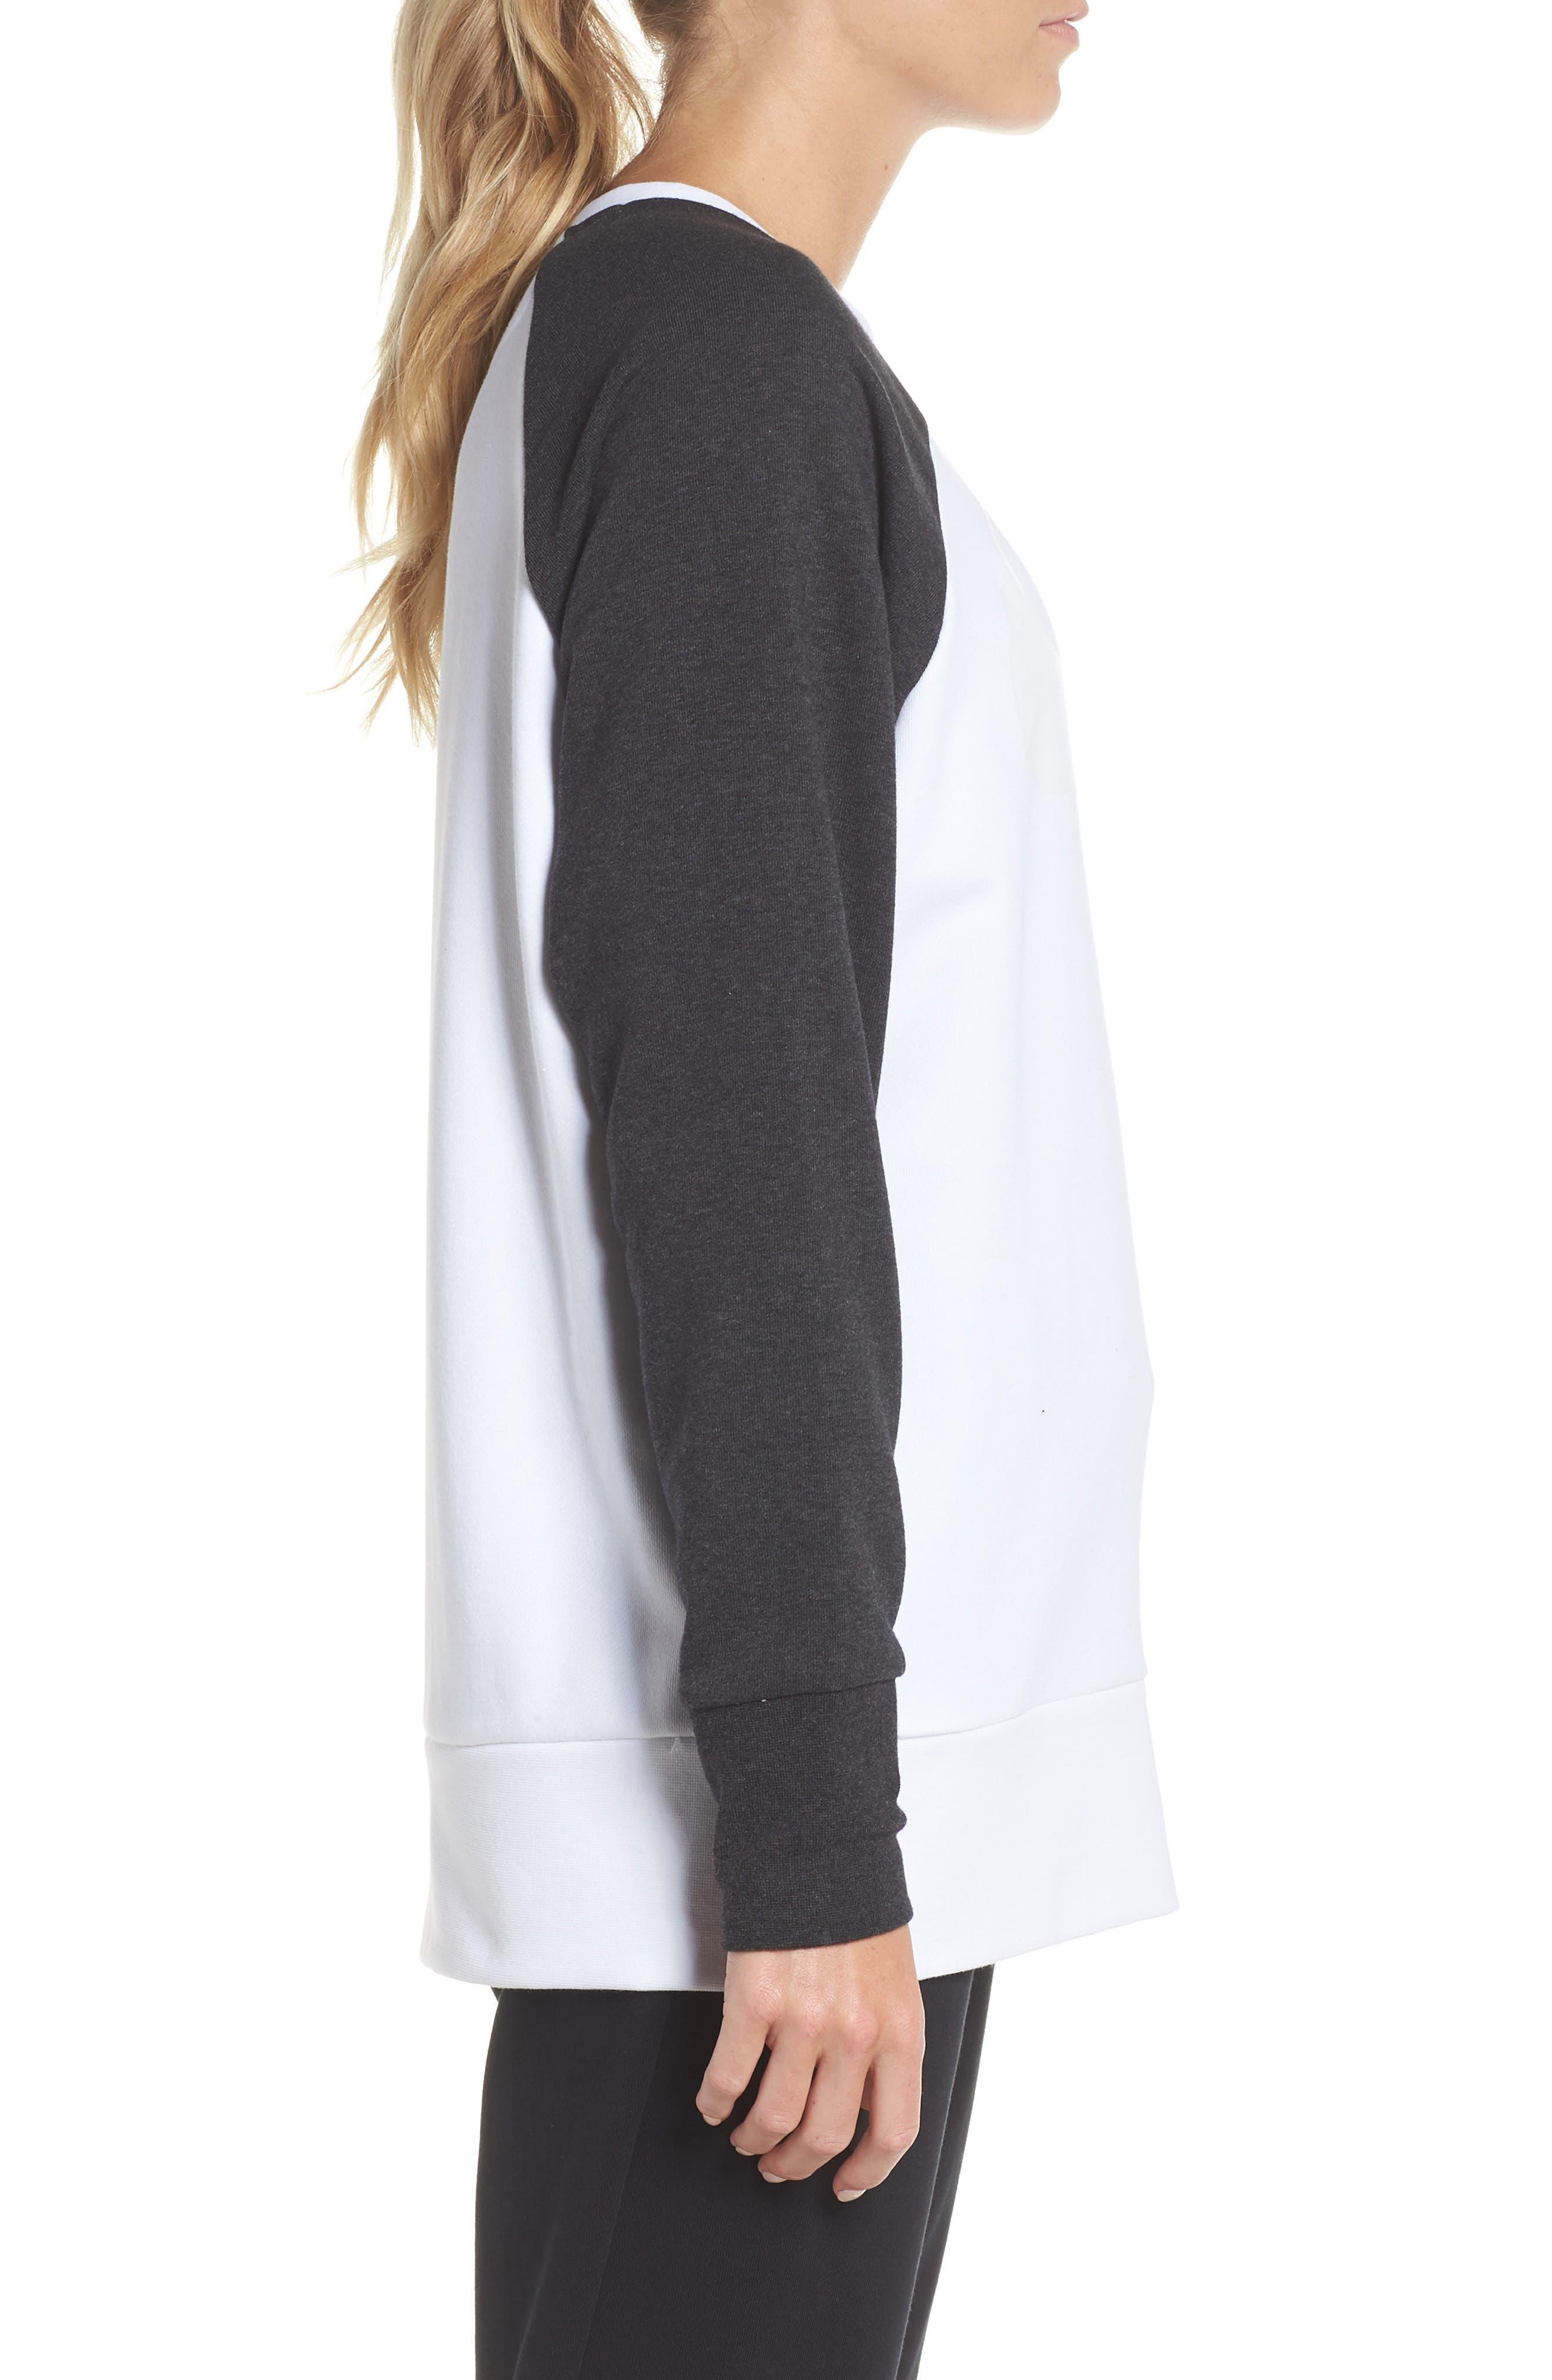 Dry Swoosh Sweatshirt,                             Alternate thumbnail 3, color,                             WHITE/ BLACK HEATHER/ WHITE